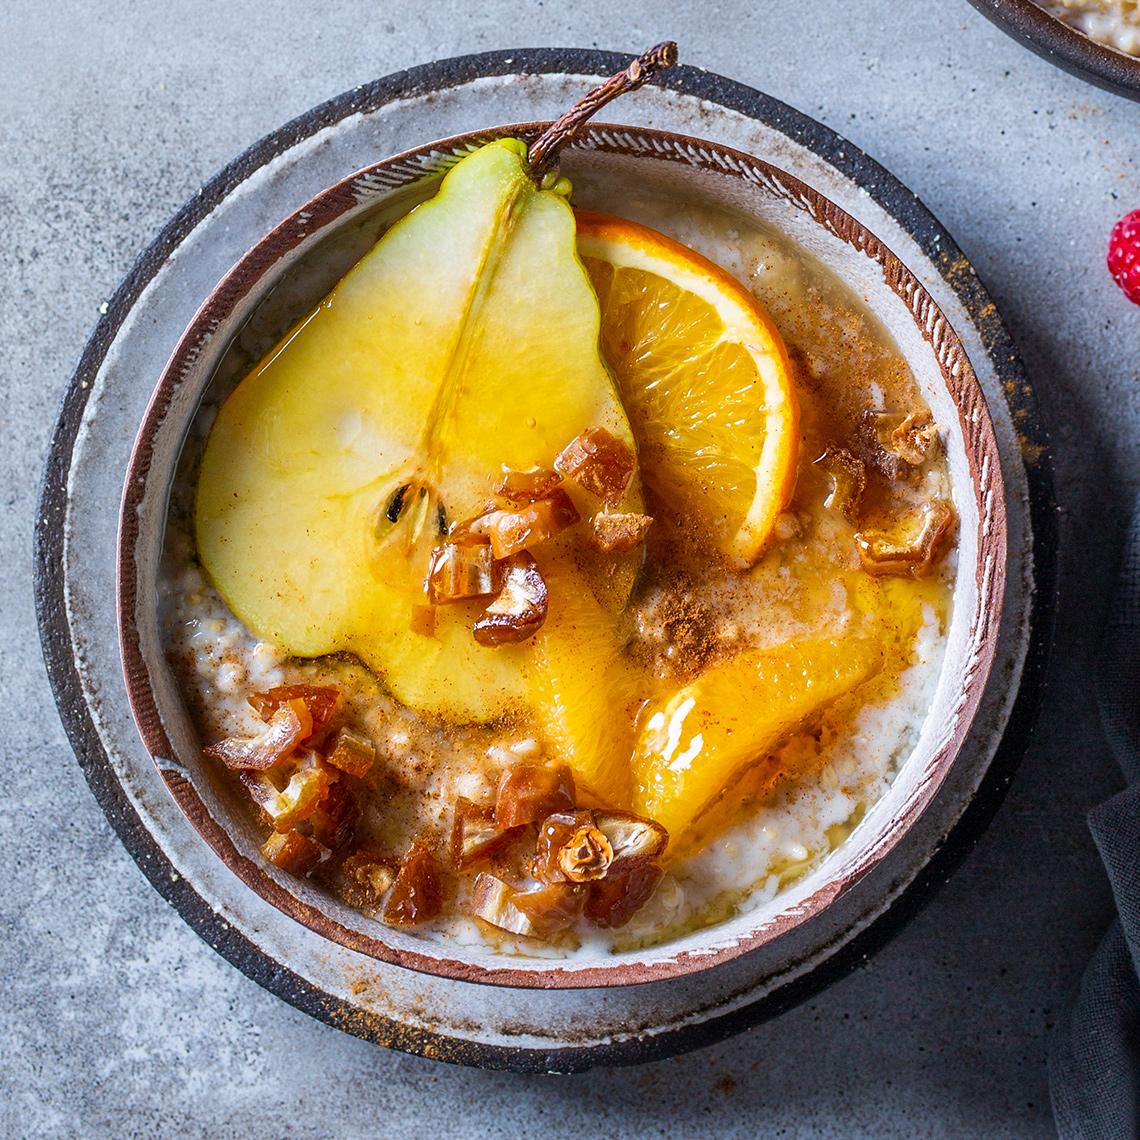 Pear, orange 'n date bowl